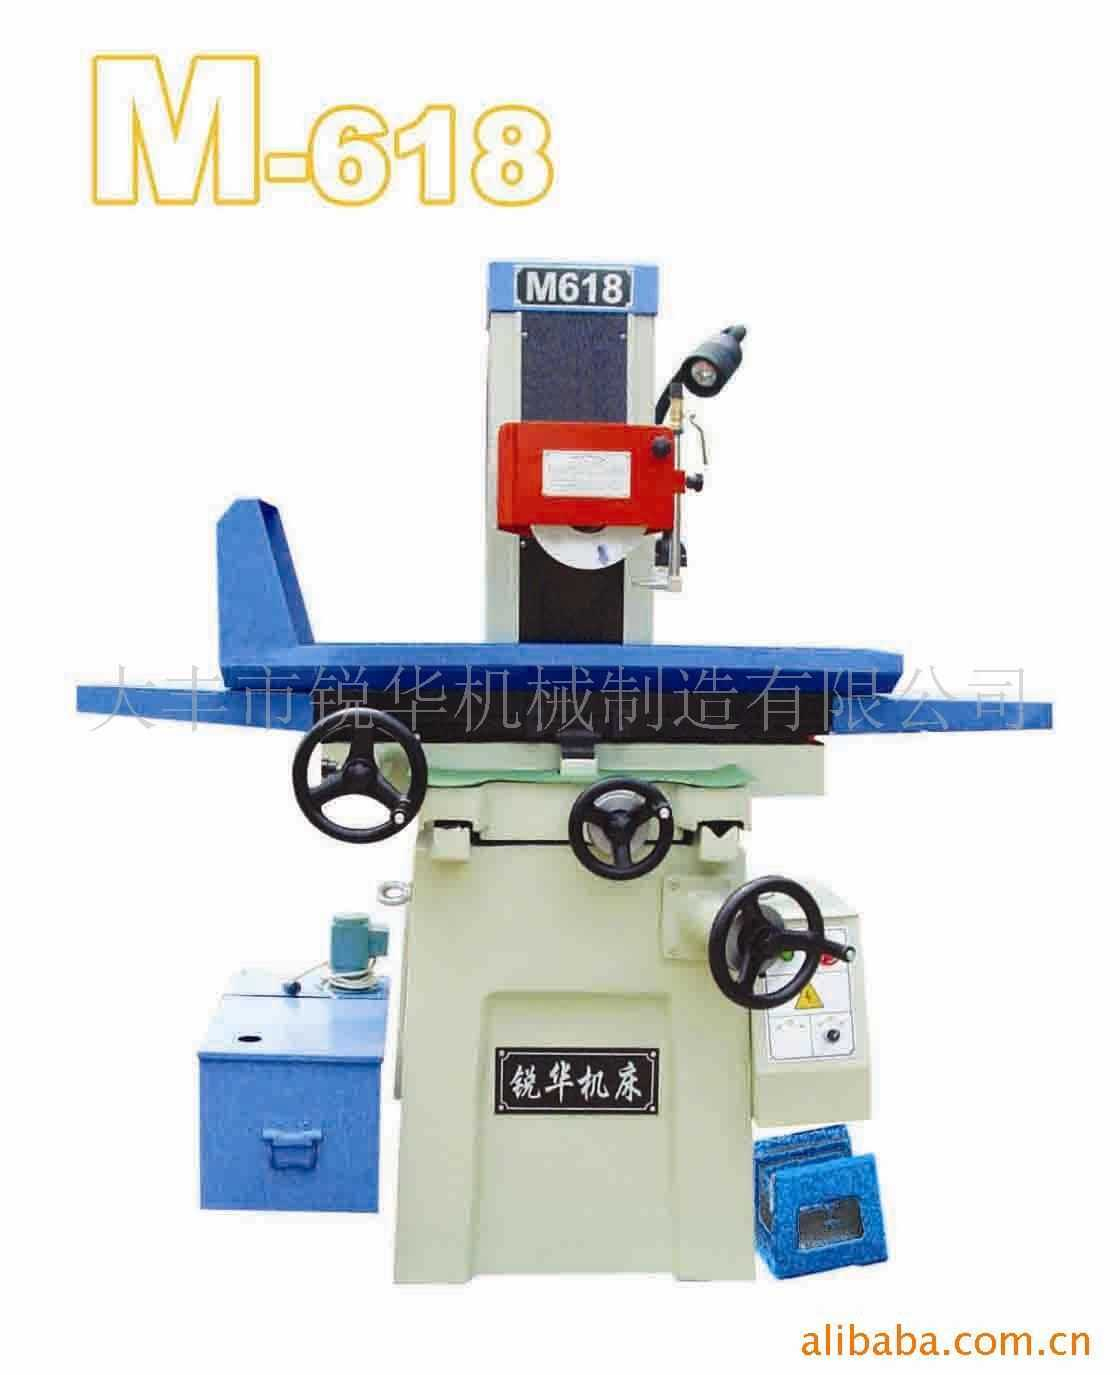 M-618卧轴矩台平面磨床